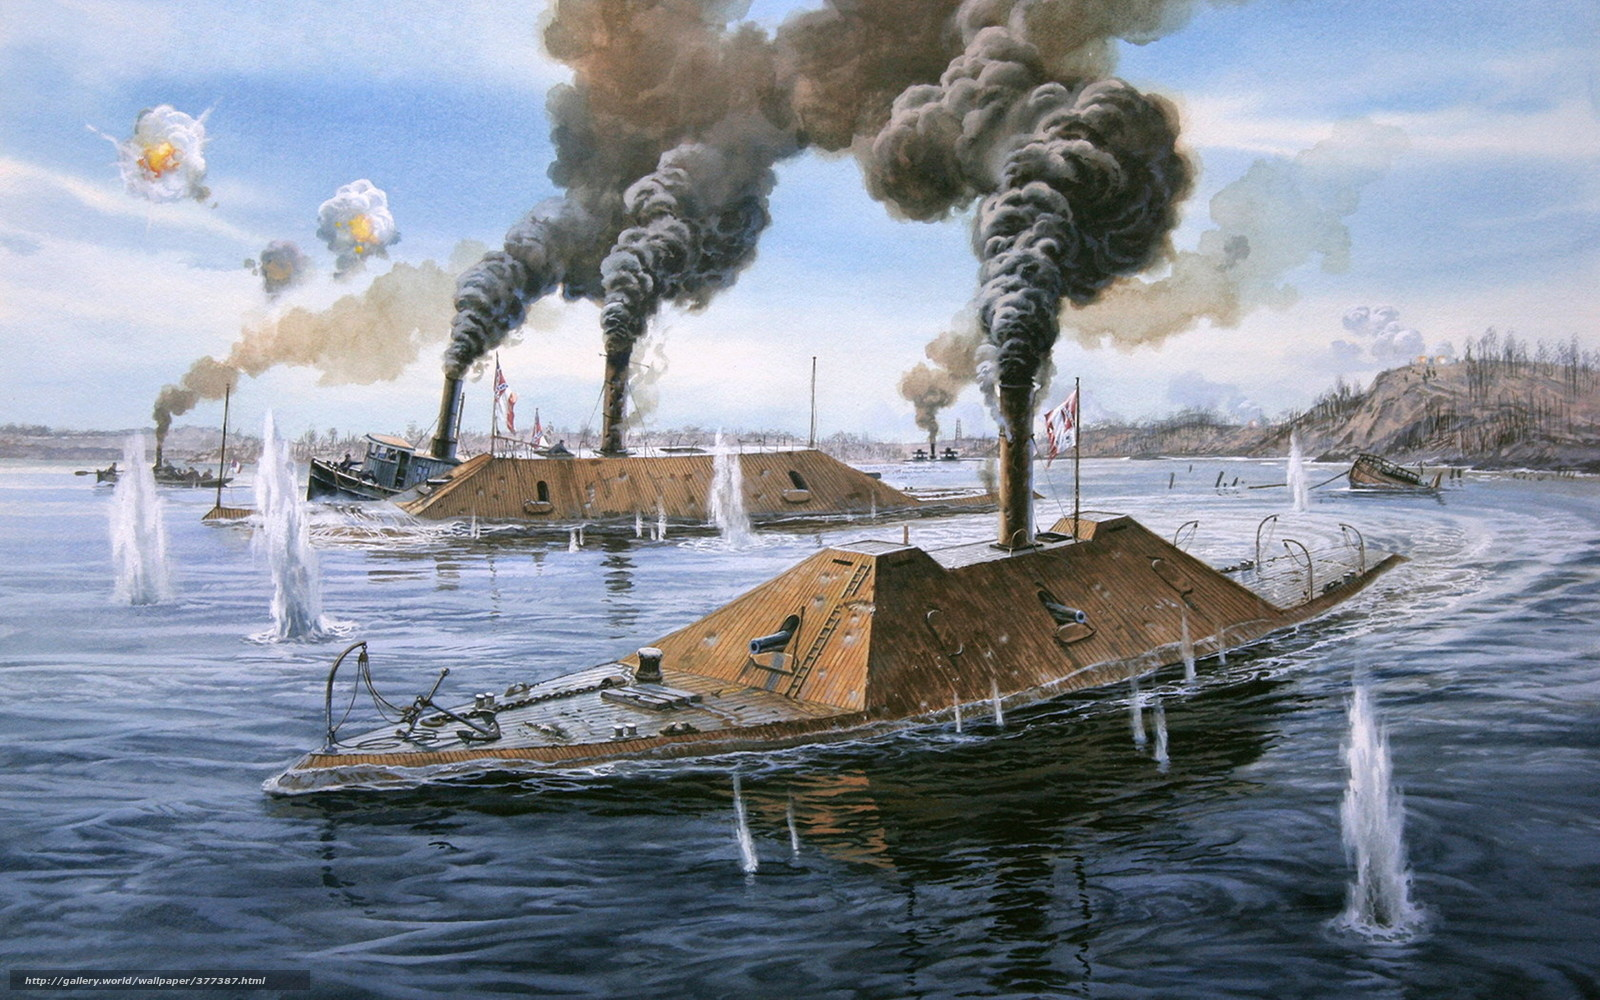 wallpaper armadillo civil war USA sea fight desktop wallpaper 1600x1000